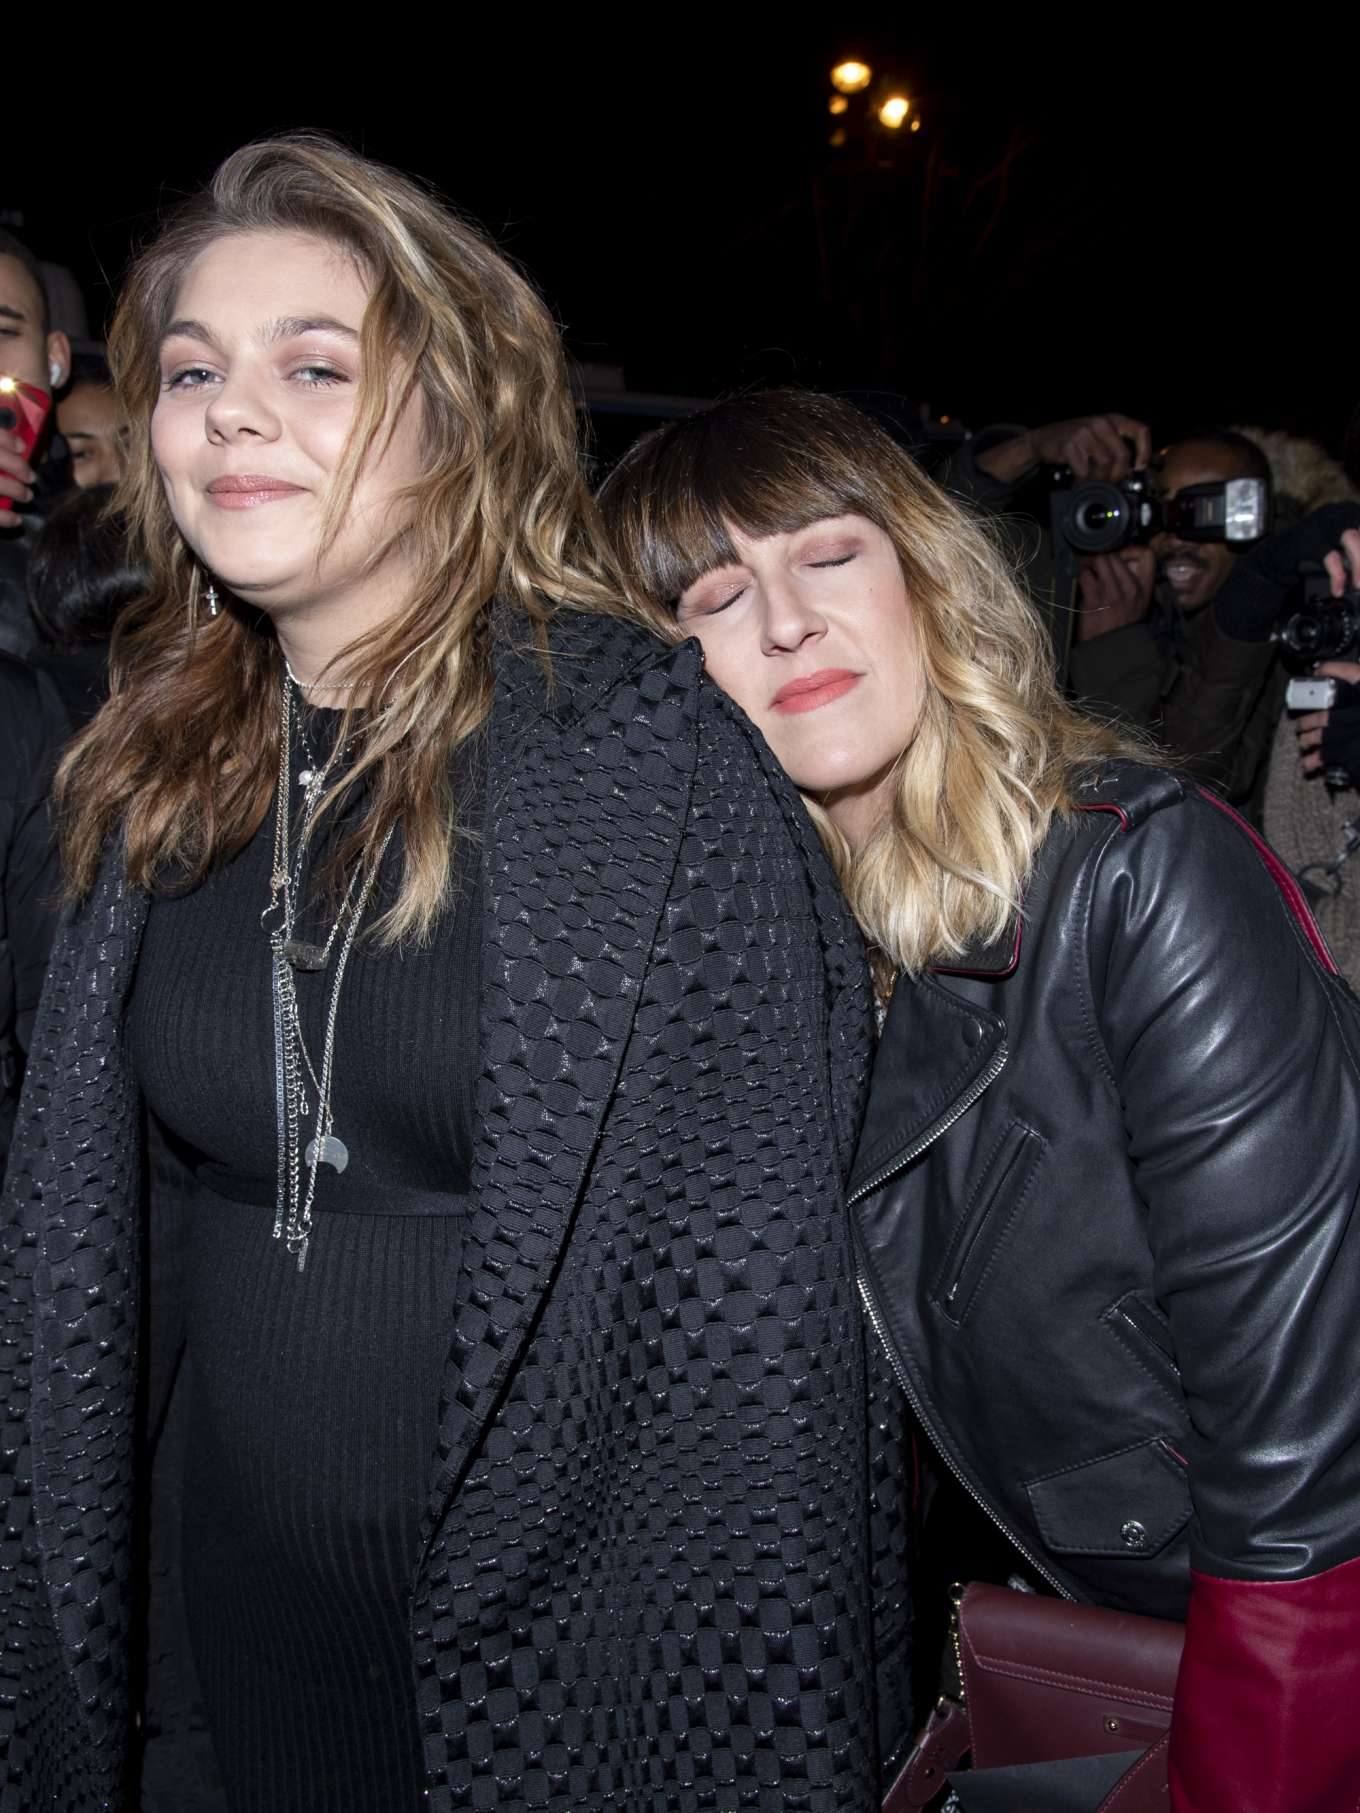 Louane Emera Outside The Jean Paul Gaultier Show In Paris 03 Gotceleb